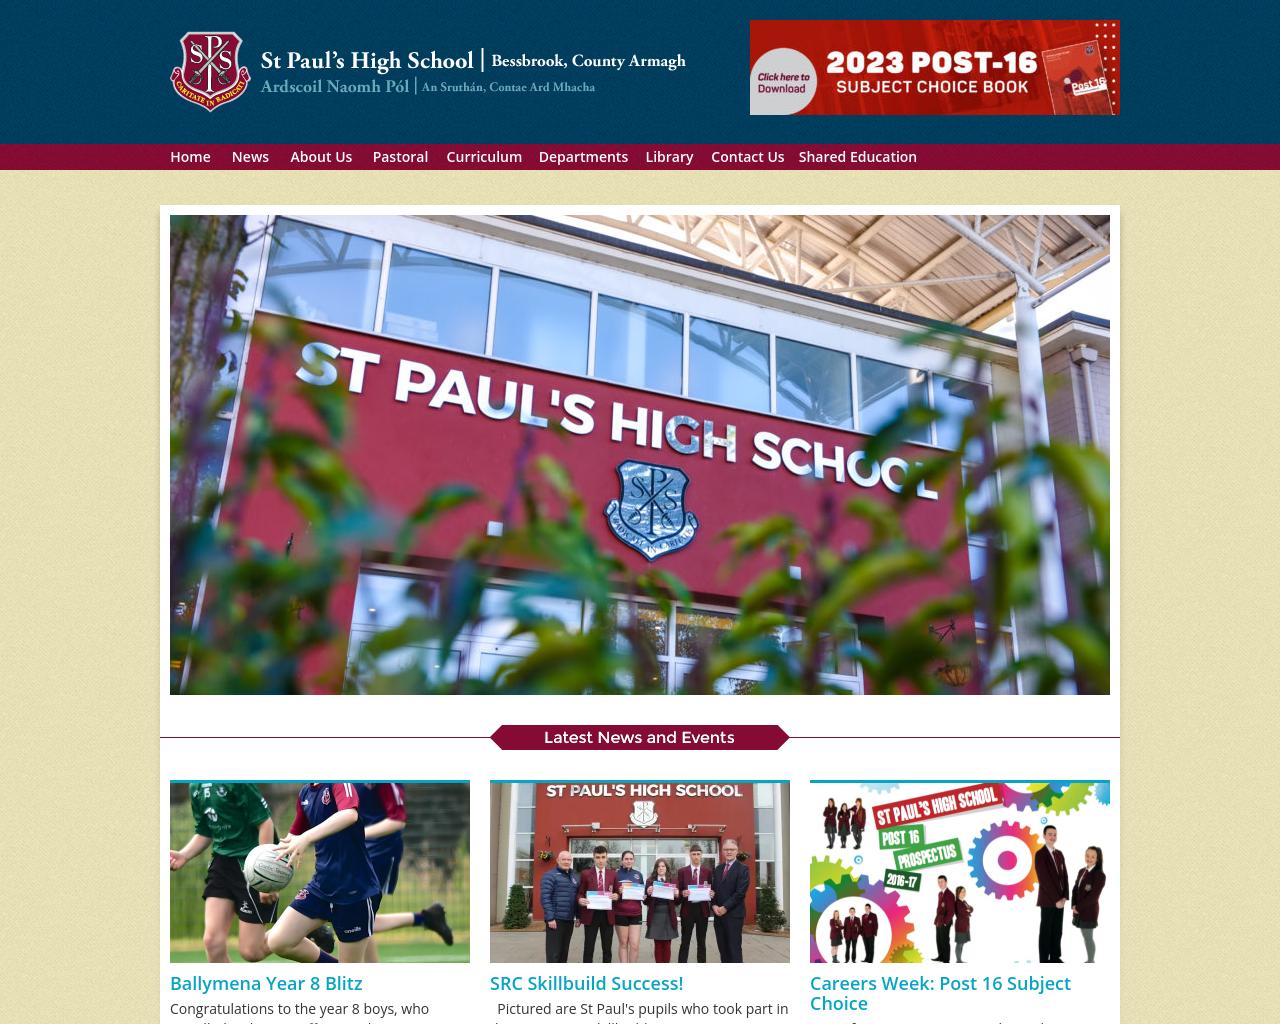 St. Paul's Co-educational High School